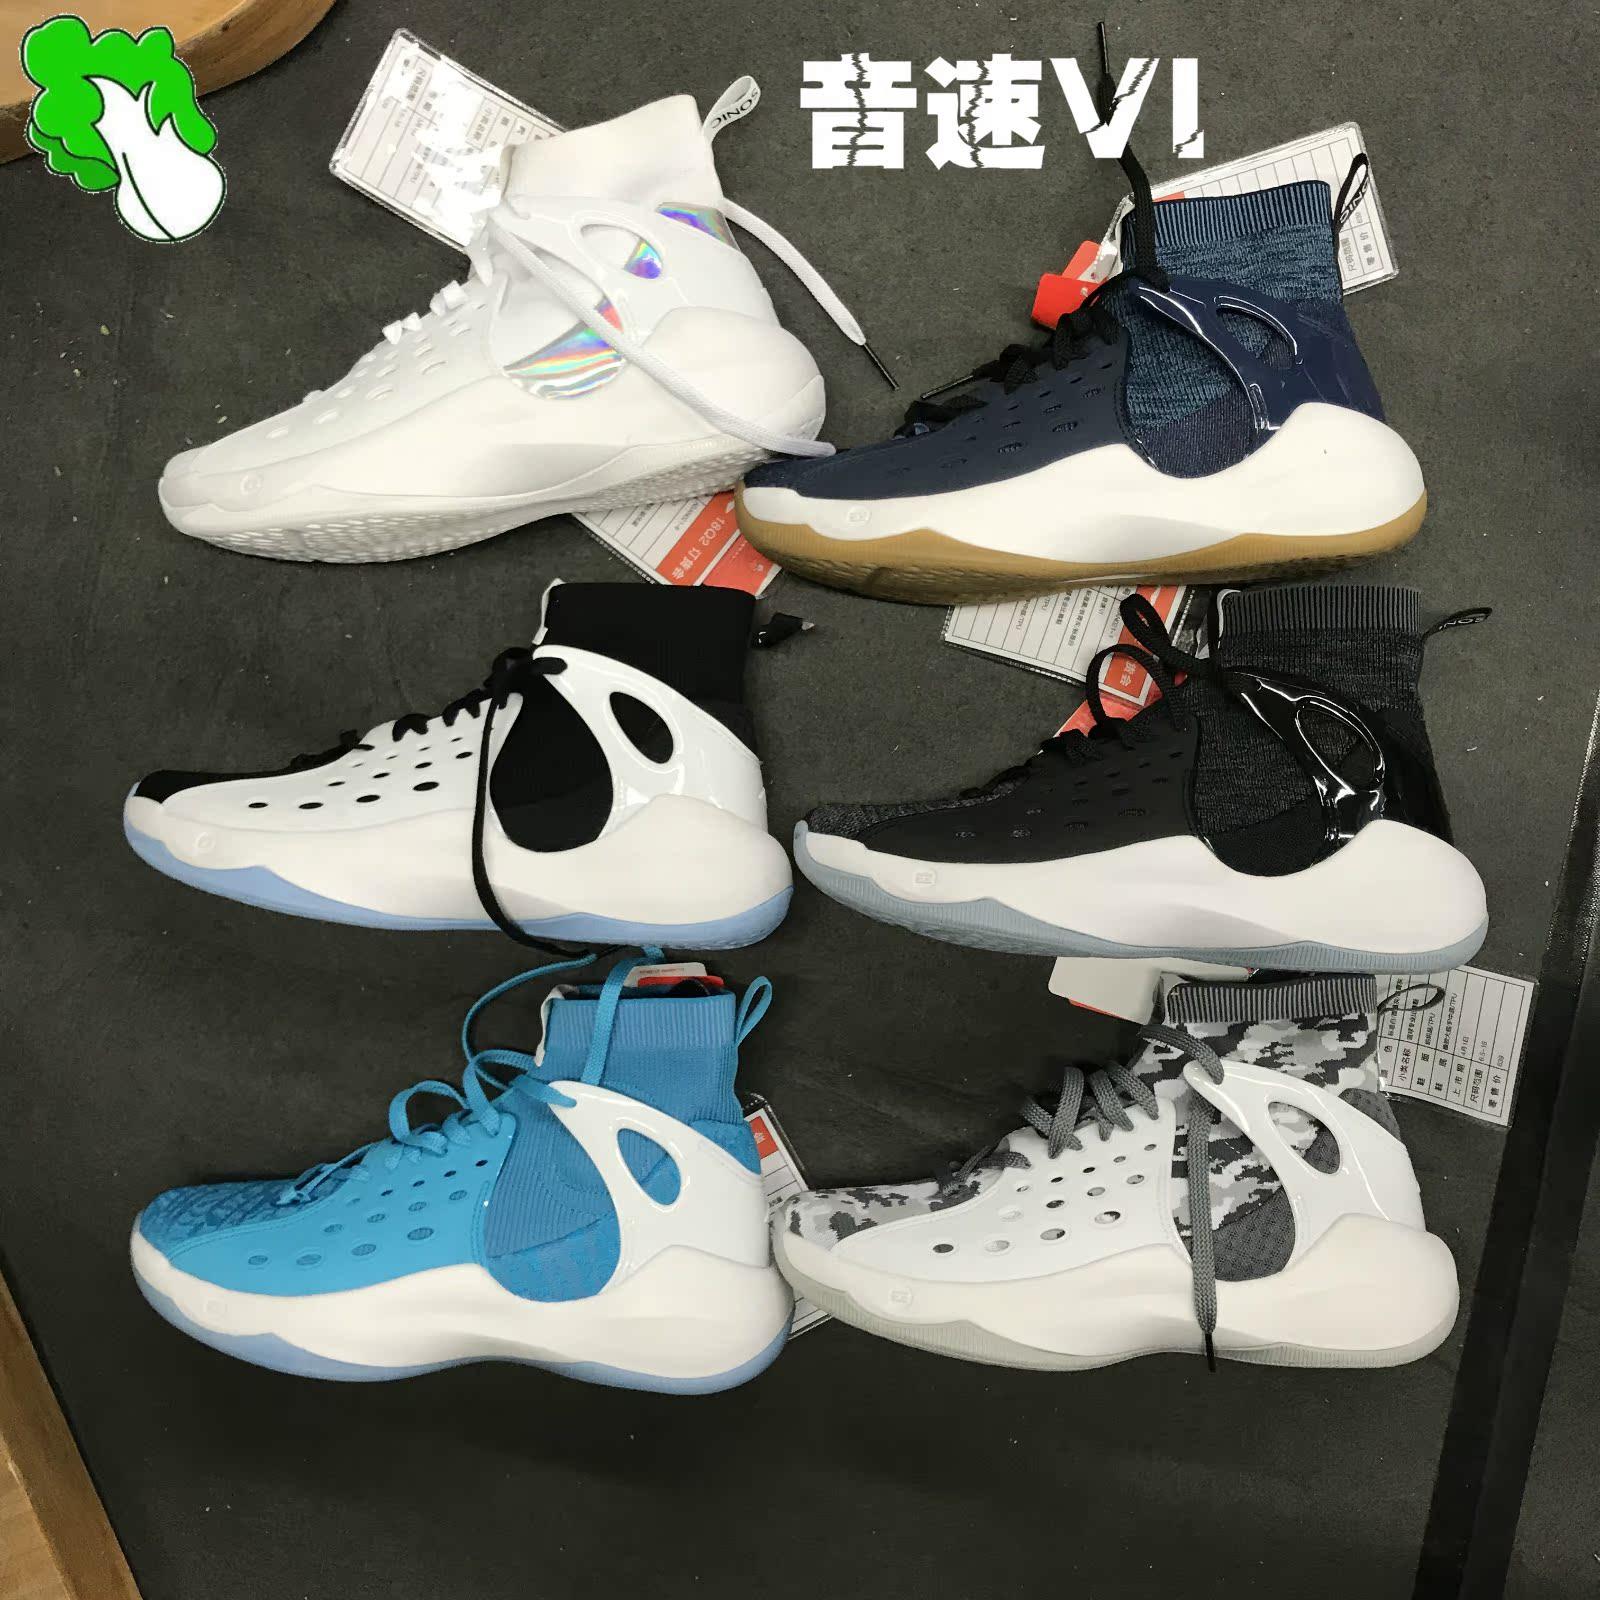 Li Ning basketball shoes 2018 summer